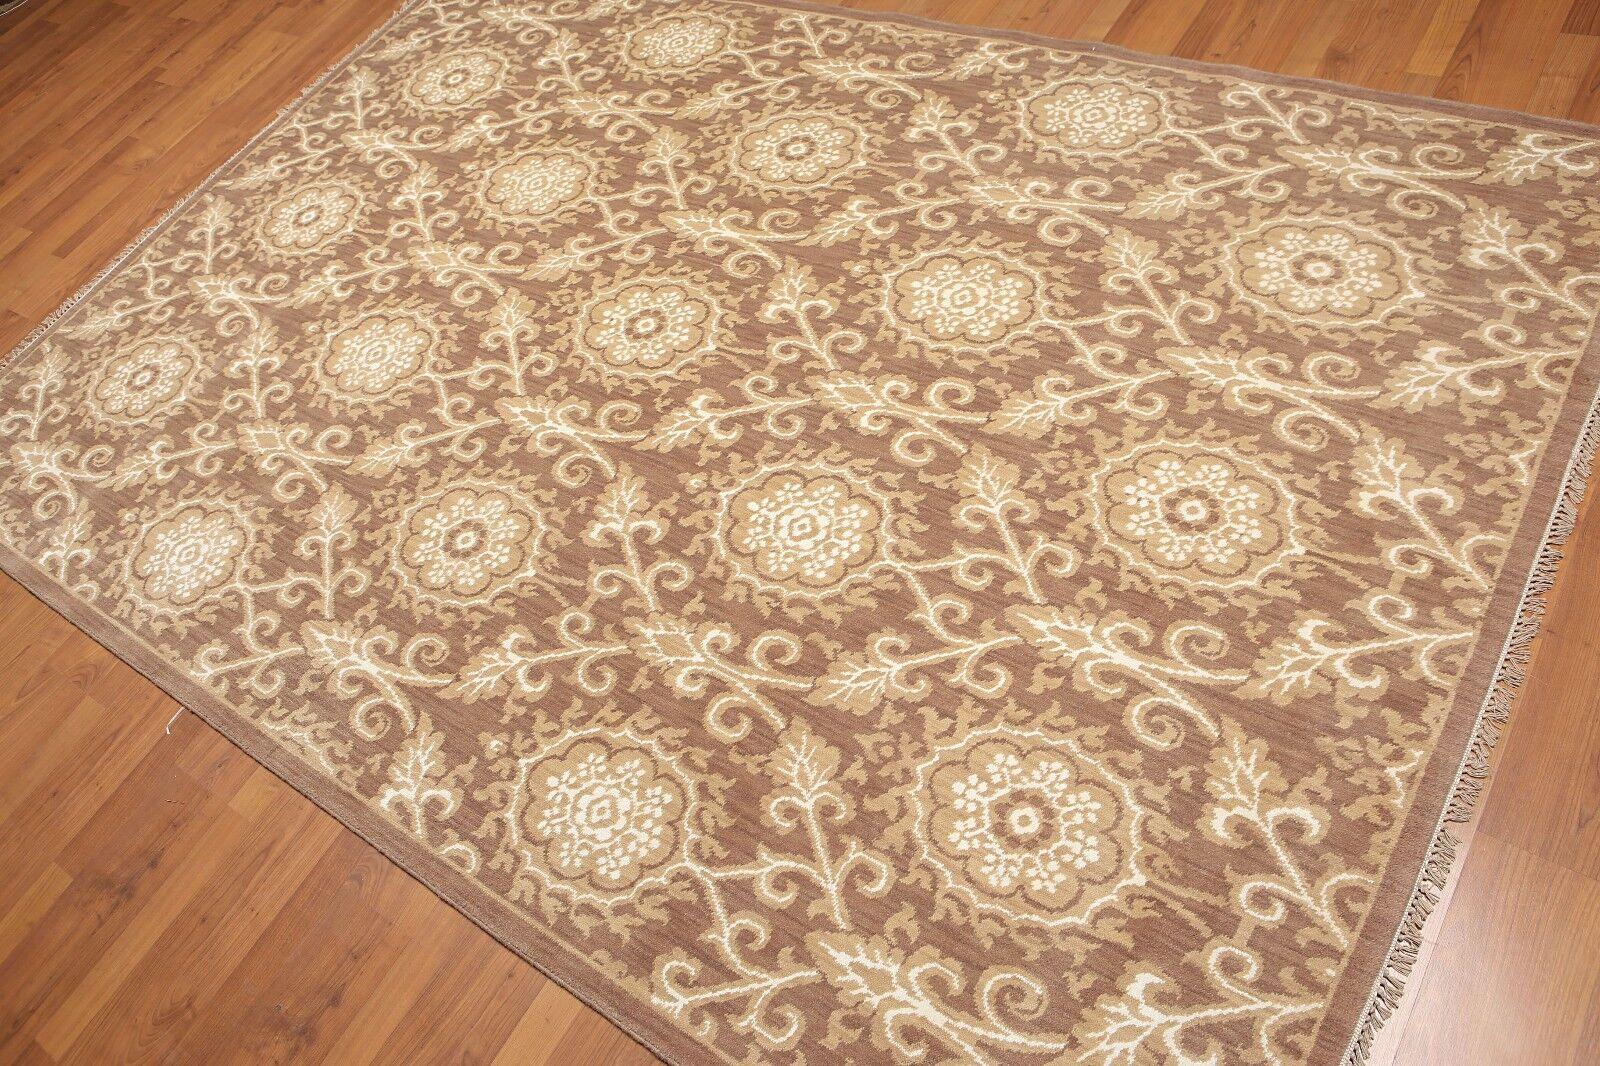 Hand Knotted Damask Wool Bamboo Silk